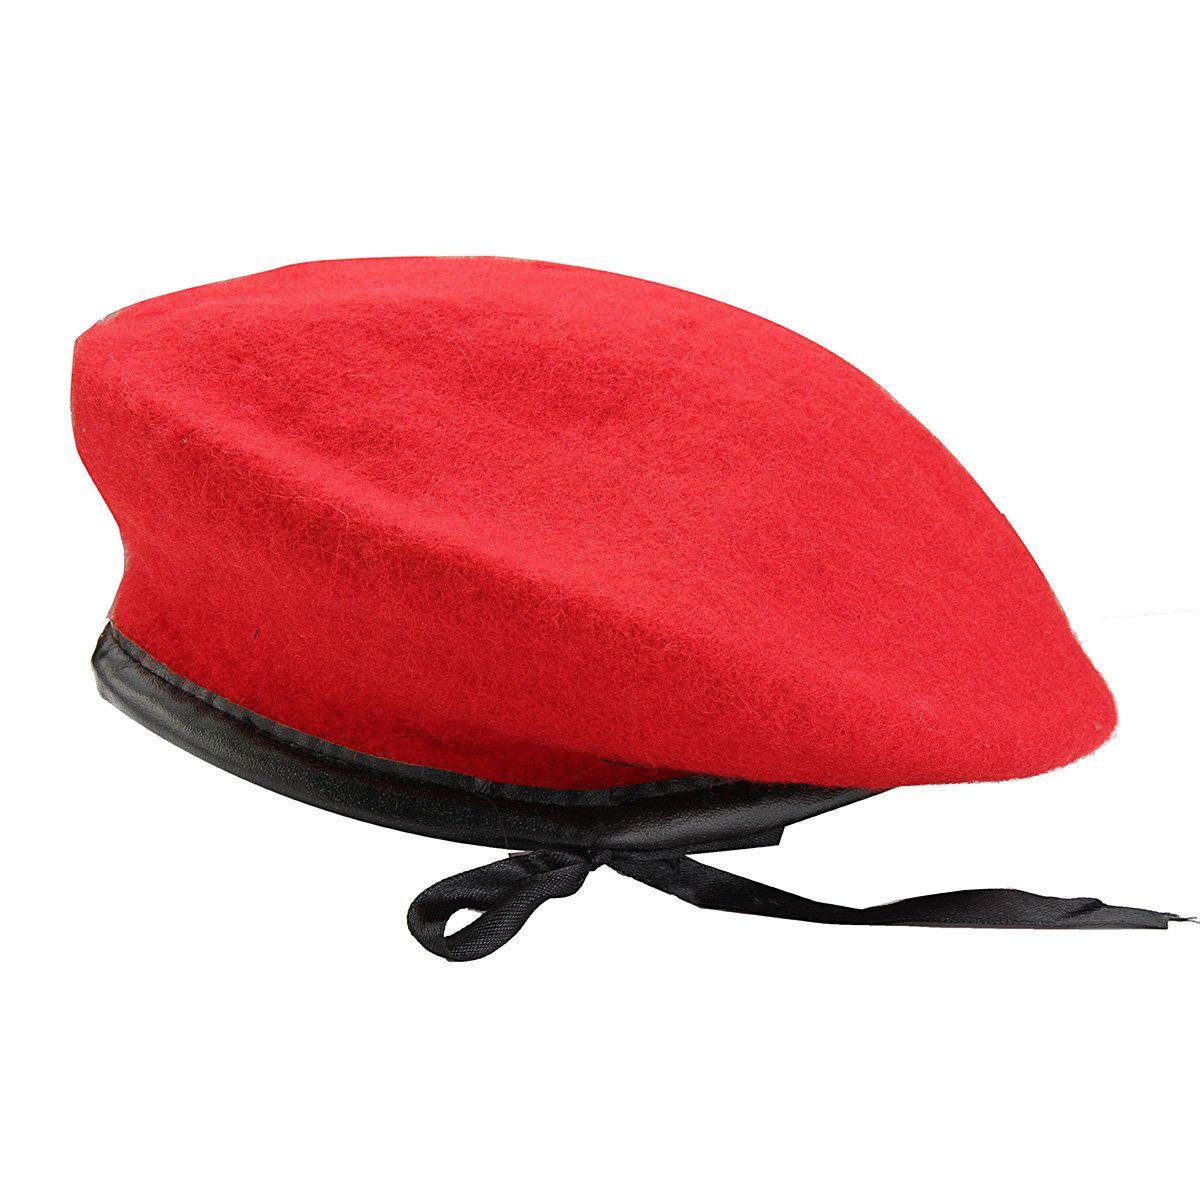 ada2dc1274120 Men Women Military Soldier Army Hat Wool Solid Beret Beanie Cap ...